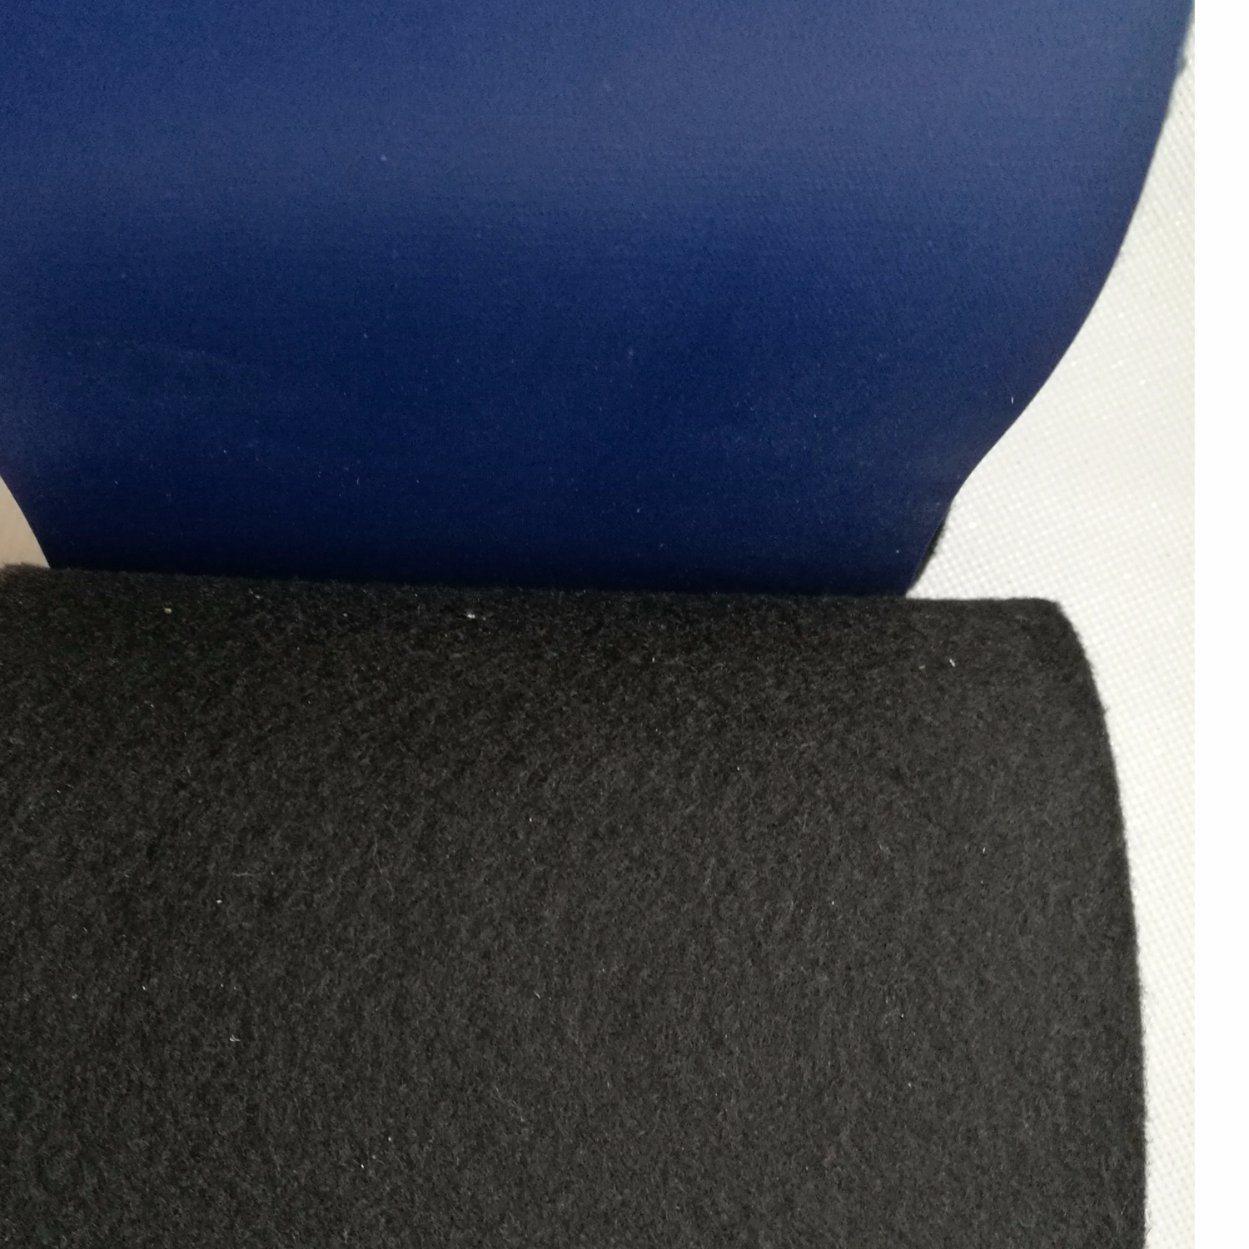 Artificial Leather Shoe Toothpick Multicolor PVC Leather